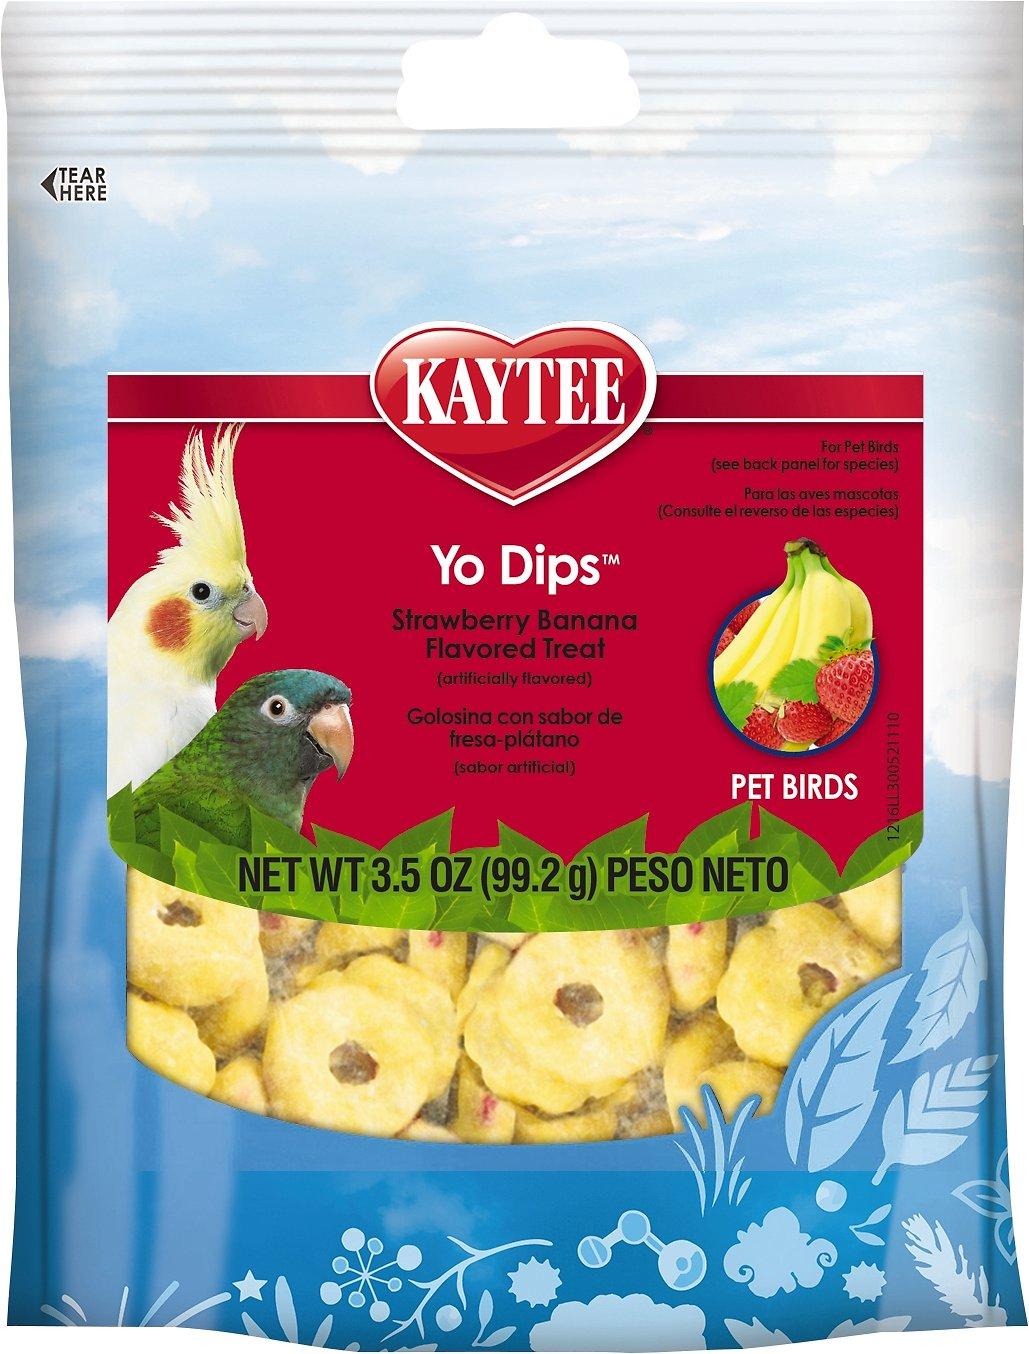 Kaytee Fiesta Strawberry Banana Flavored Yogurt Dipped Small Hookbill Bird Treats, 3.5-oz bag